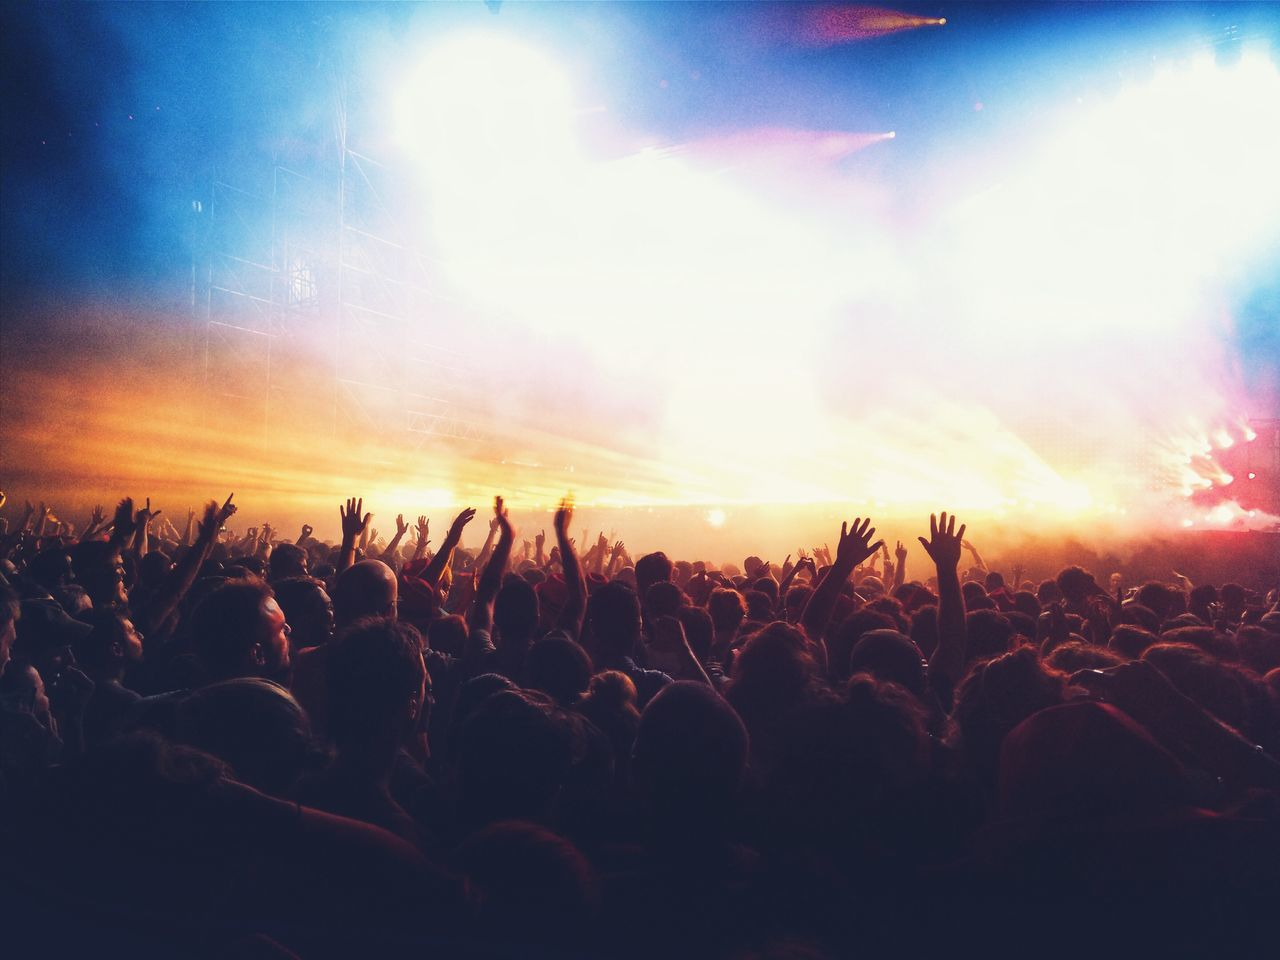 Crowd enjoying illuminated music concert at night